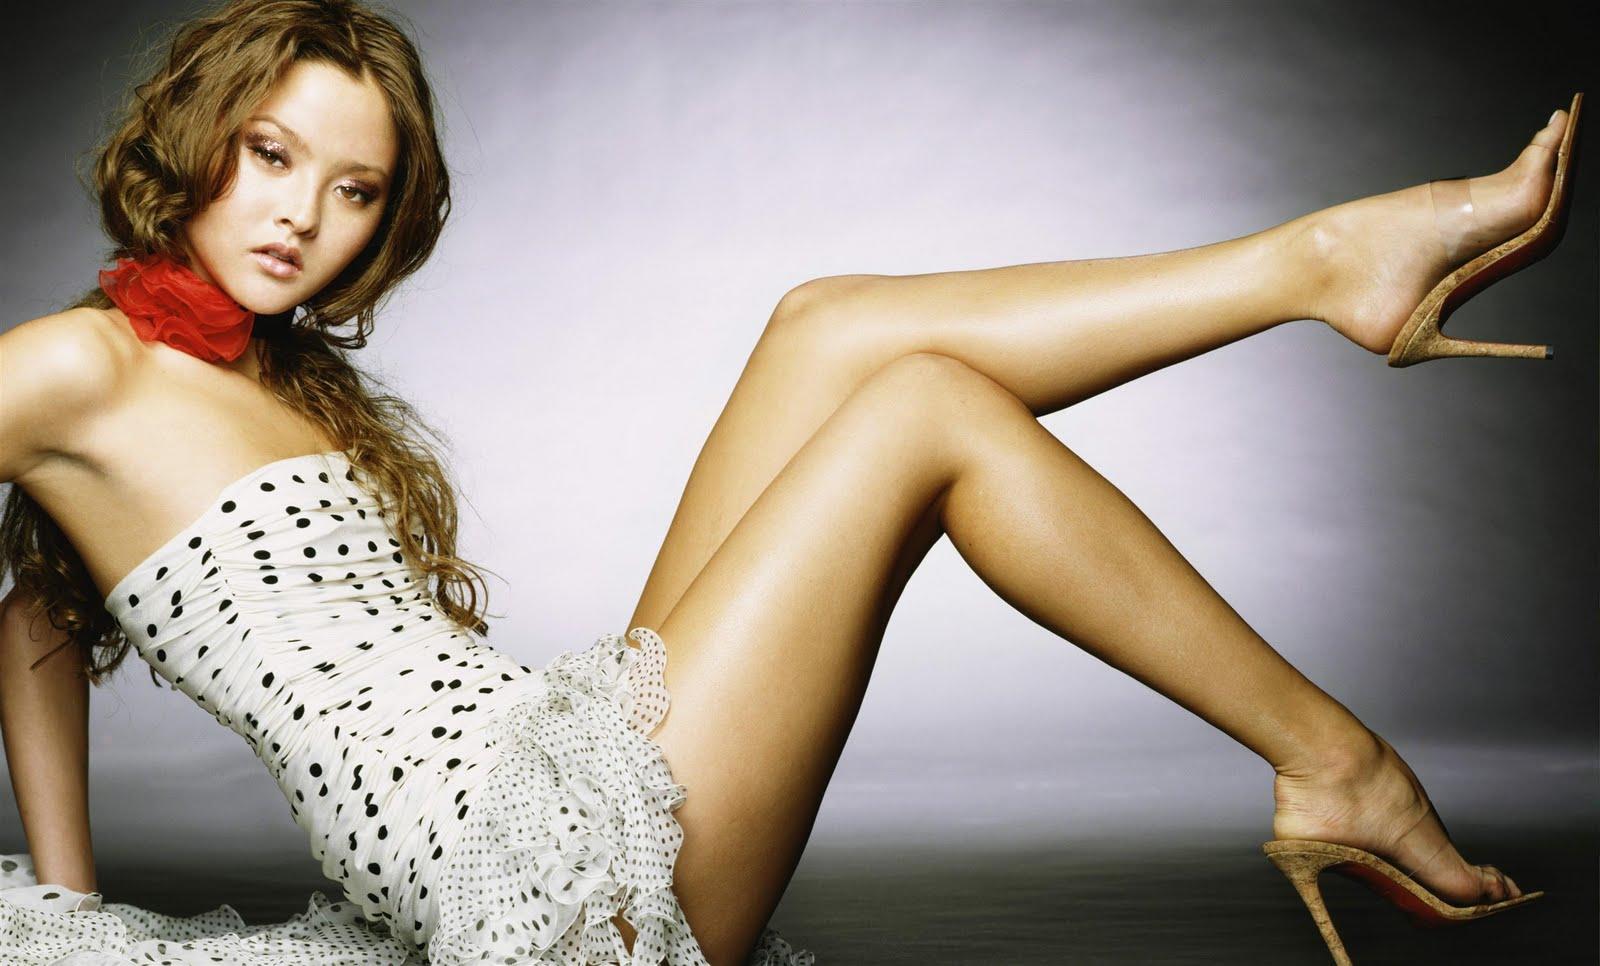 Devon Aoki Feet Legs And Shoes Photos 1600x966